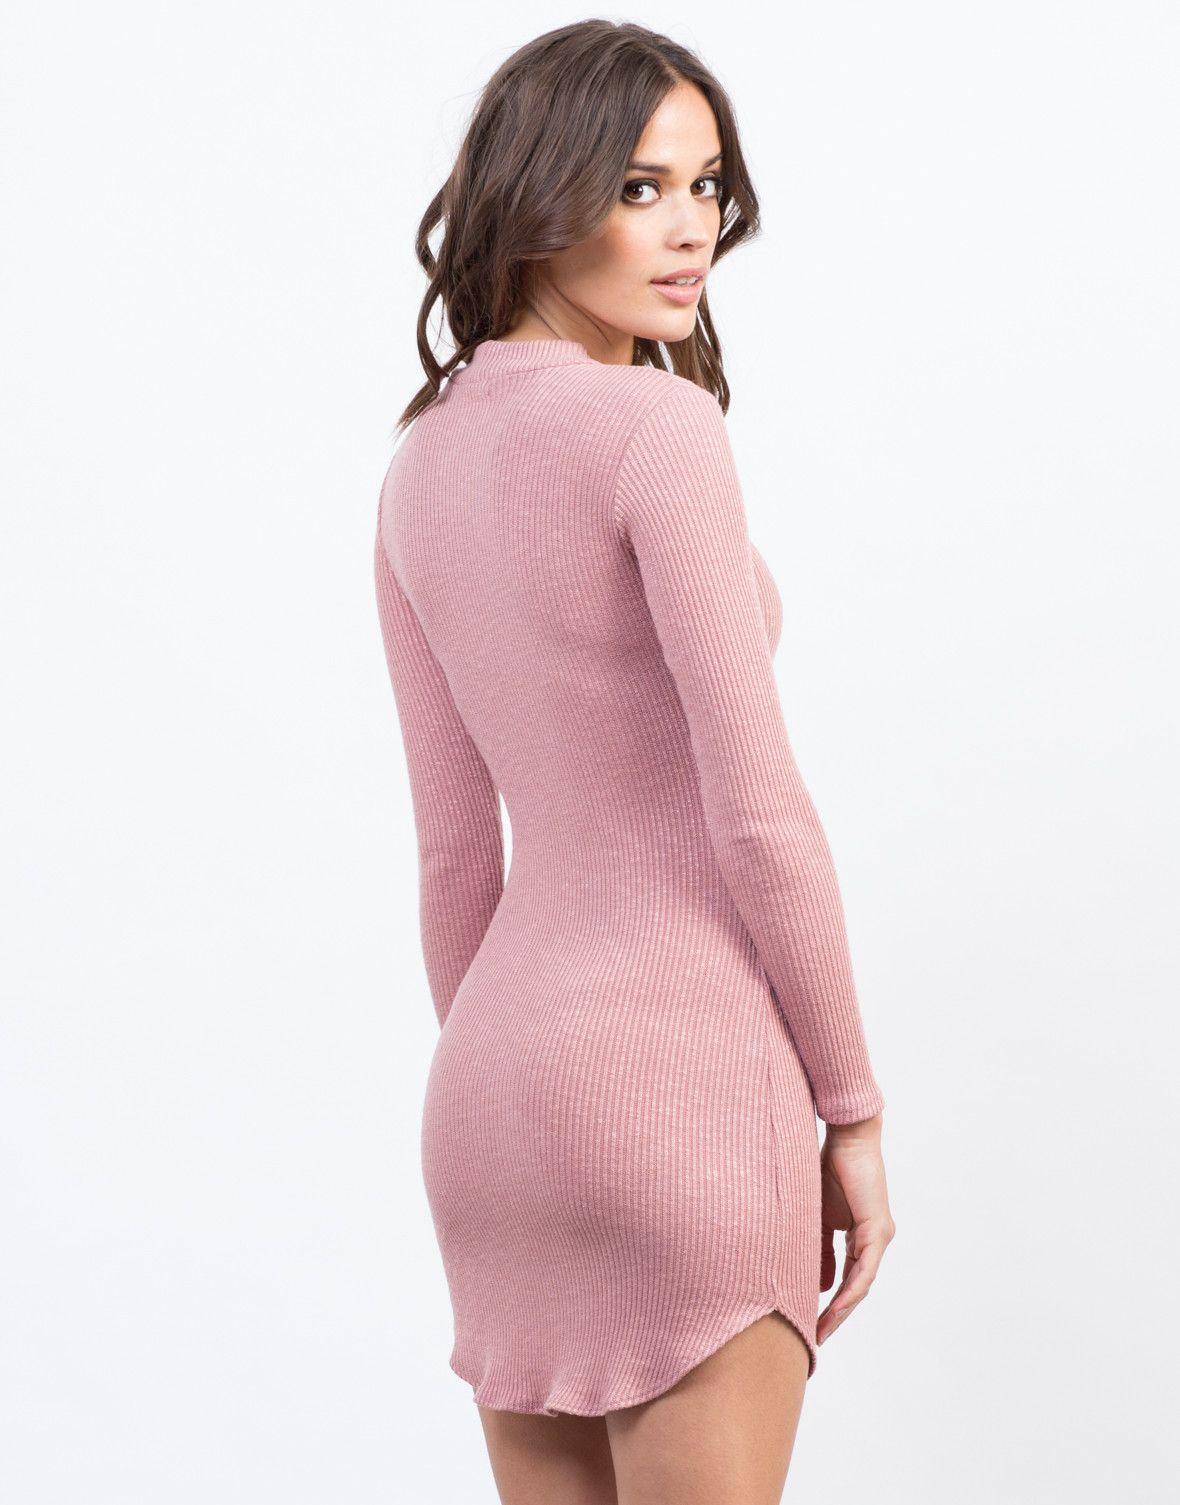 Ribbed Shirt Dress | Pink dresses, Hemline and Hand washing